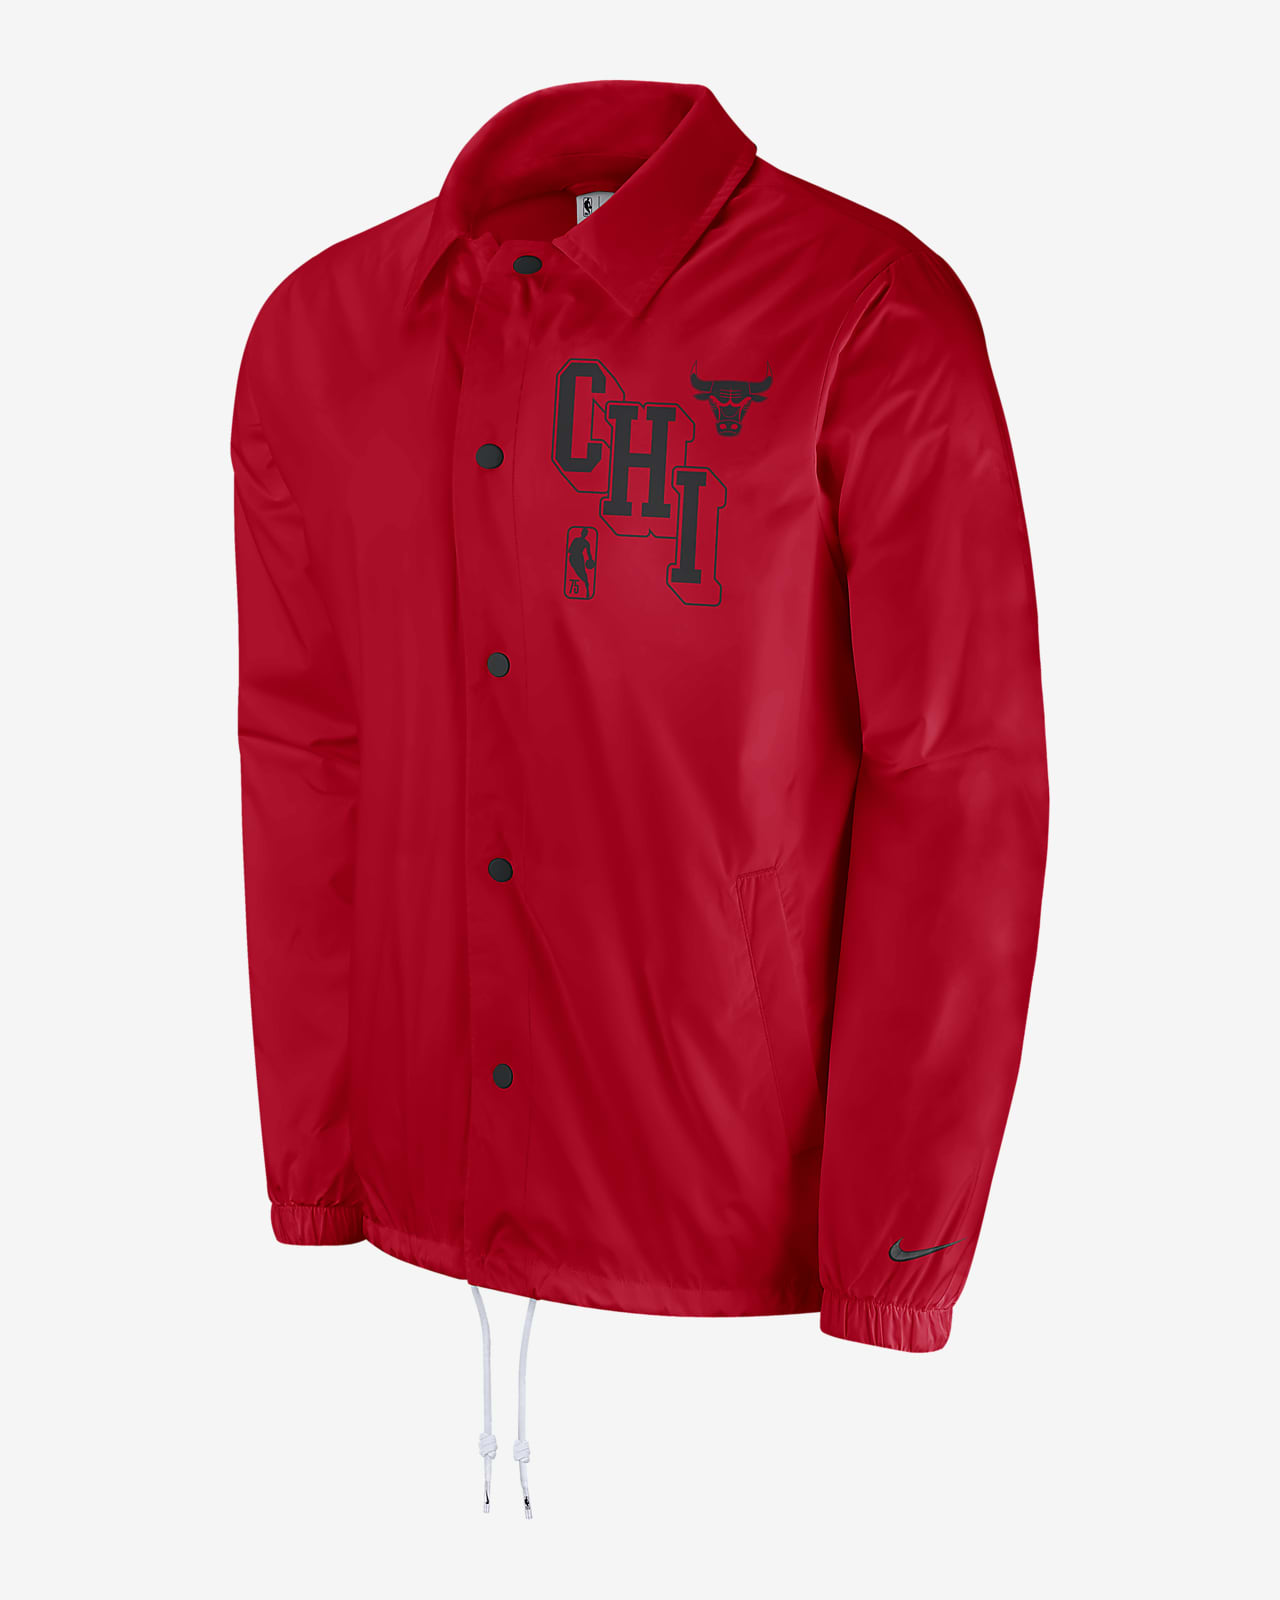 Chicago Bulls Courtside Men's Nike NBA Coach's Jacket